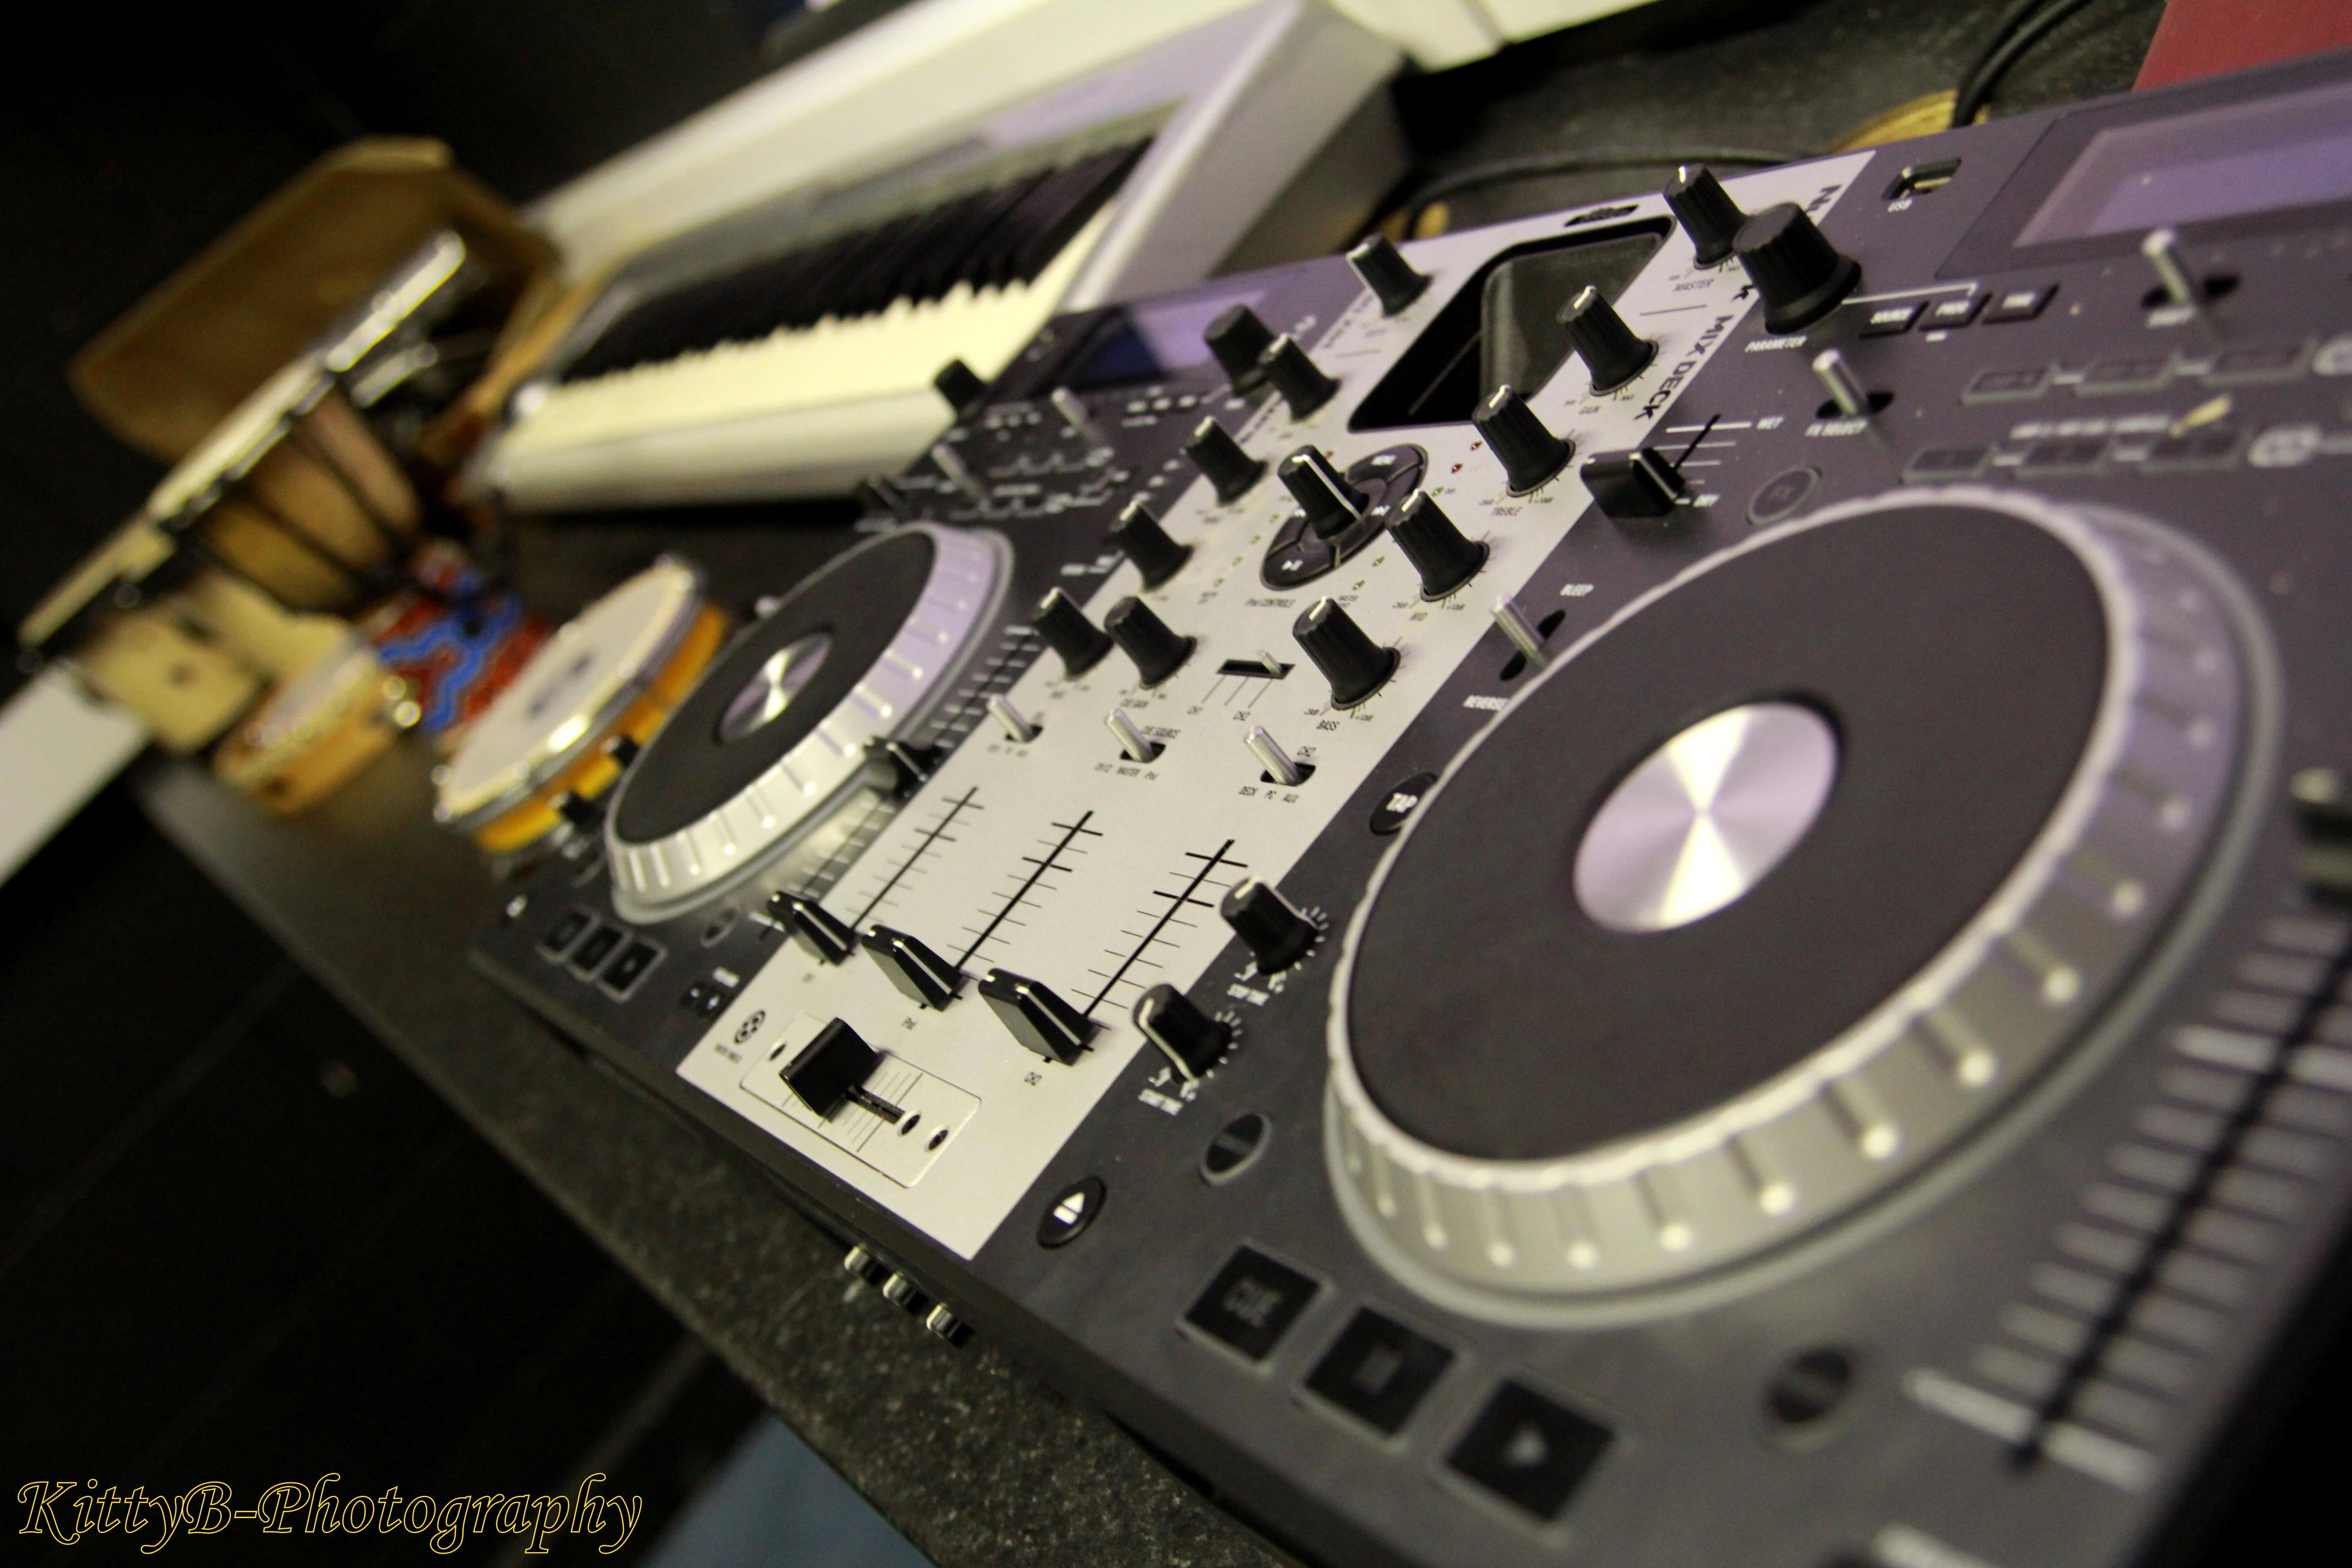 techno gear in music room